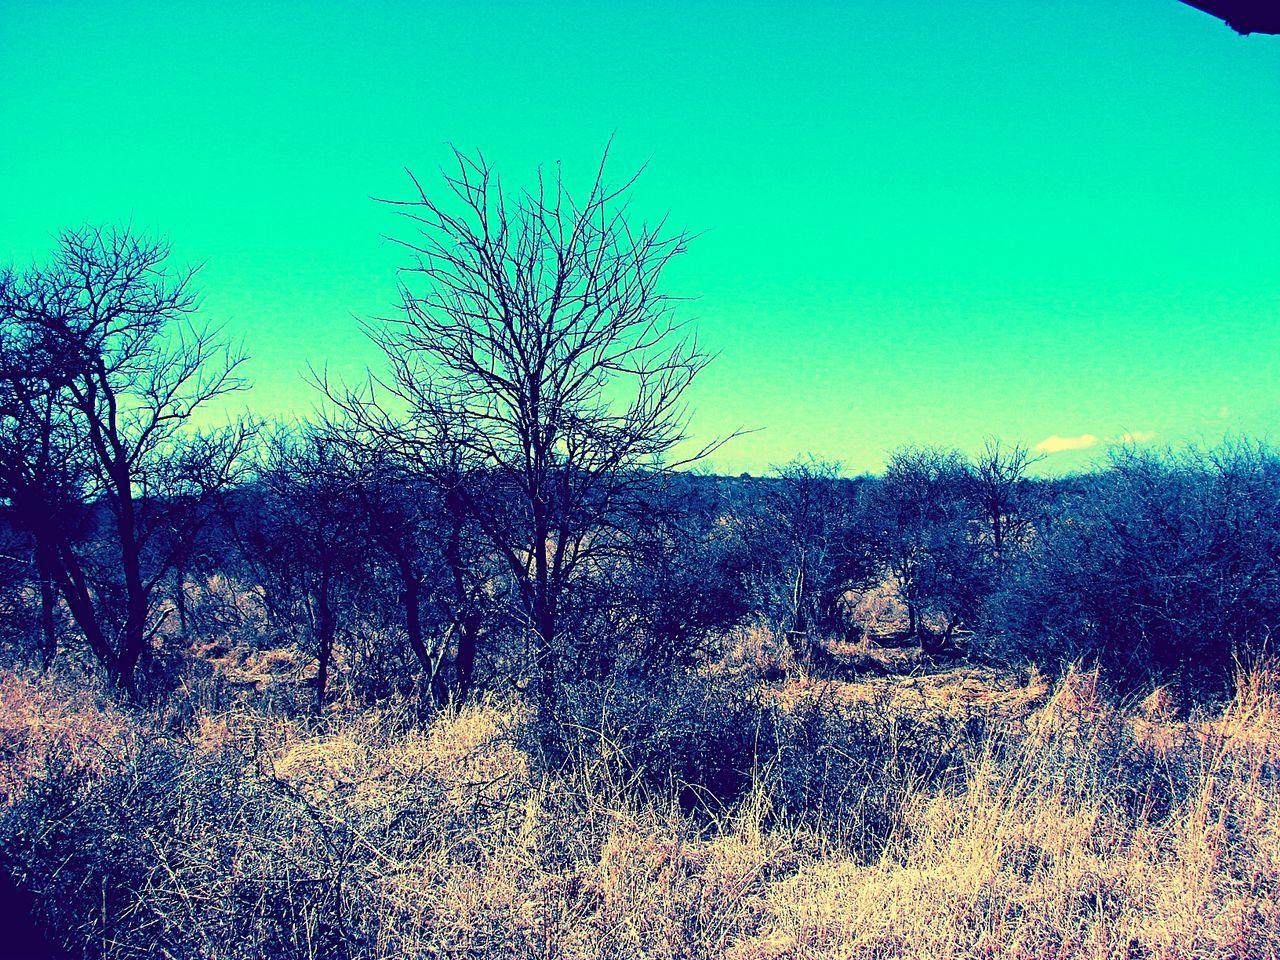 African Bush Bushveld EyeEm Nature Lover EyeEm Vision Field Growth Landscape Nature Tranquil Scene